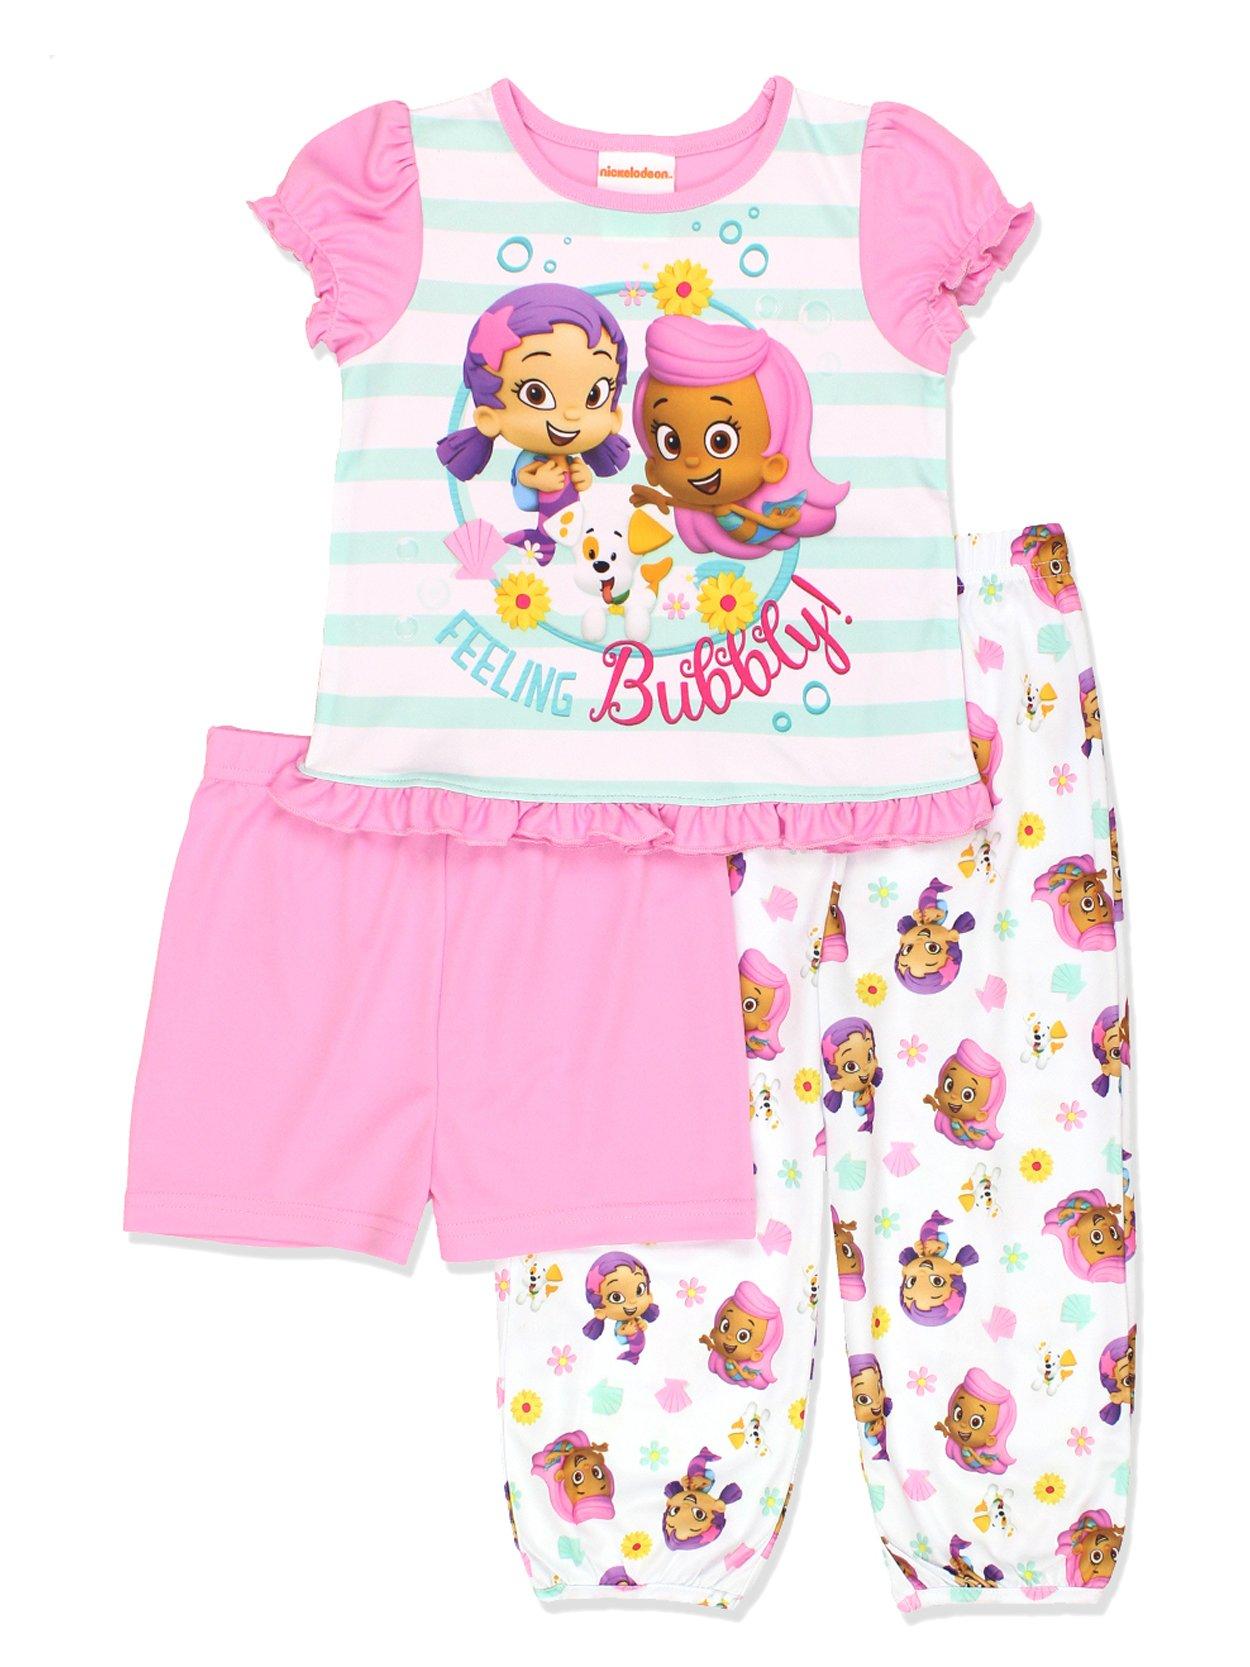 Bubble Guppies Girls 3 Piece Pajamas Set (Toddler)